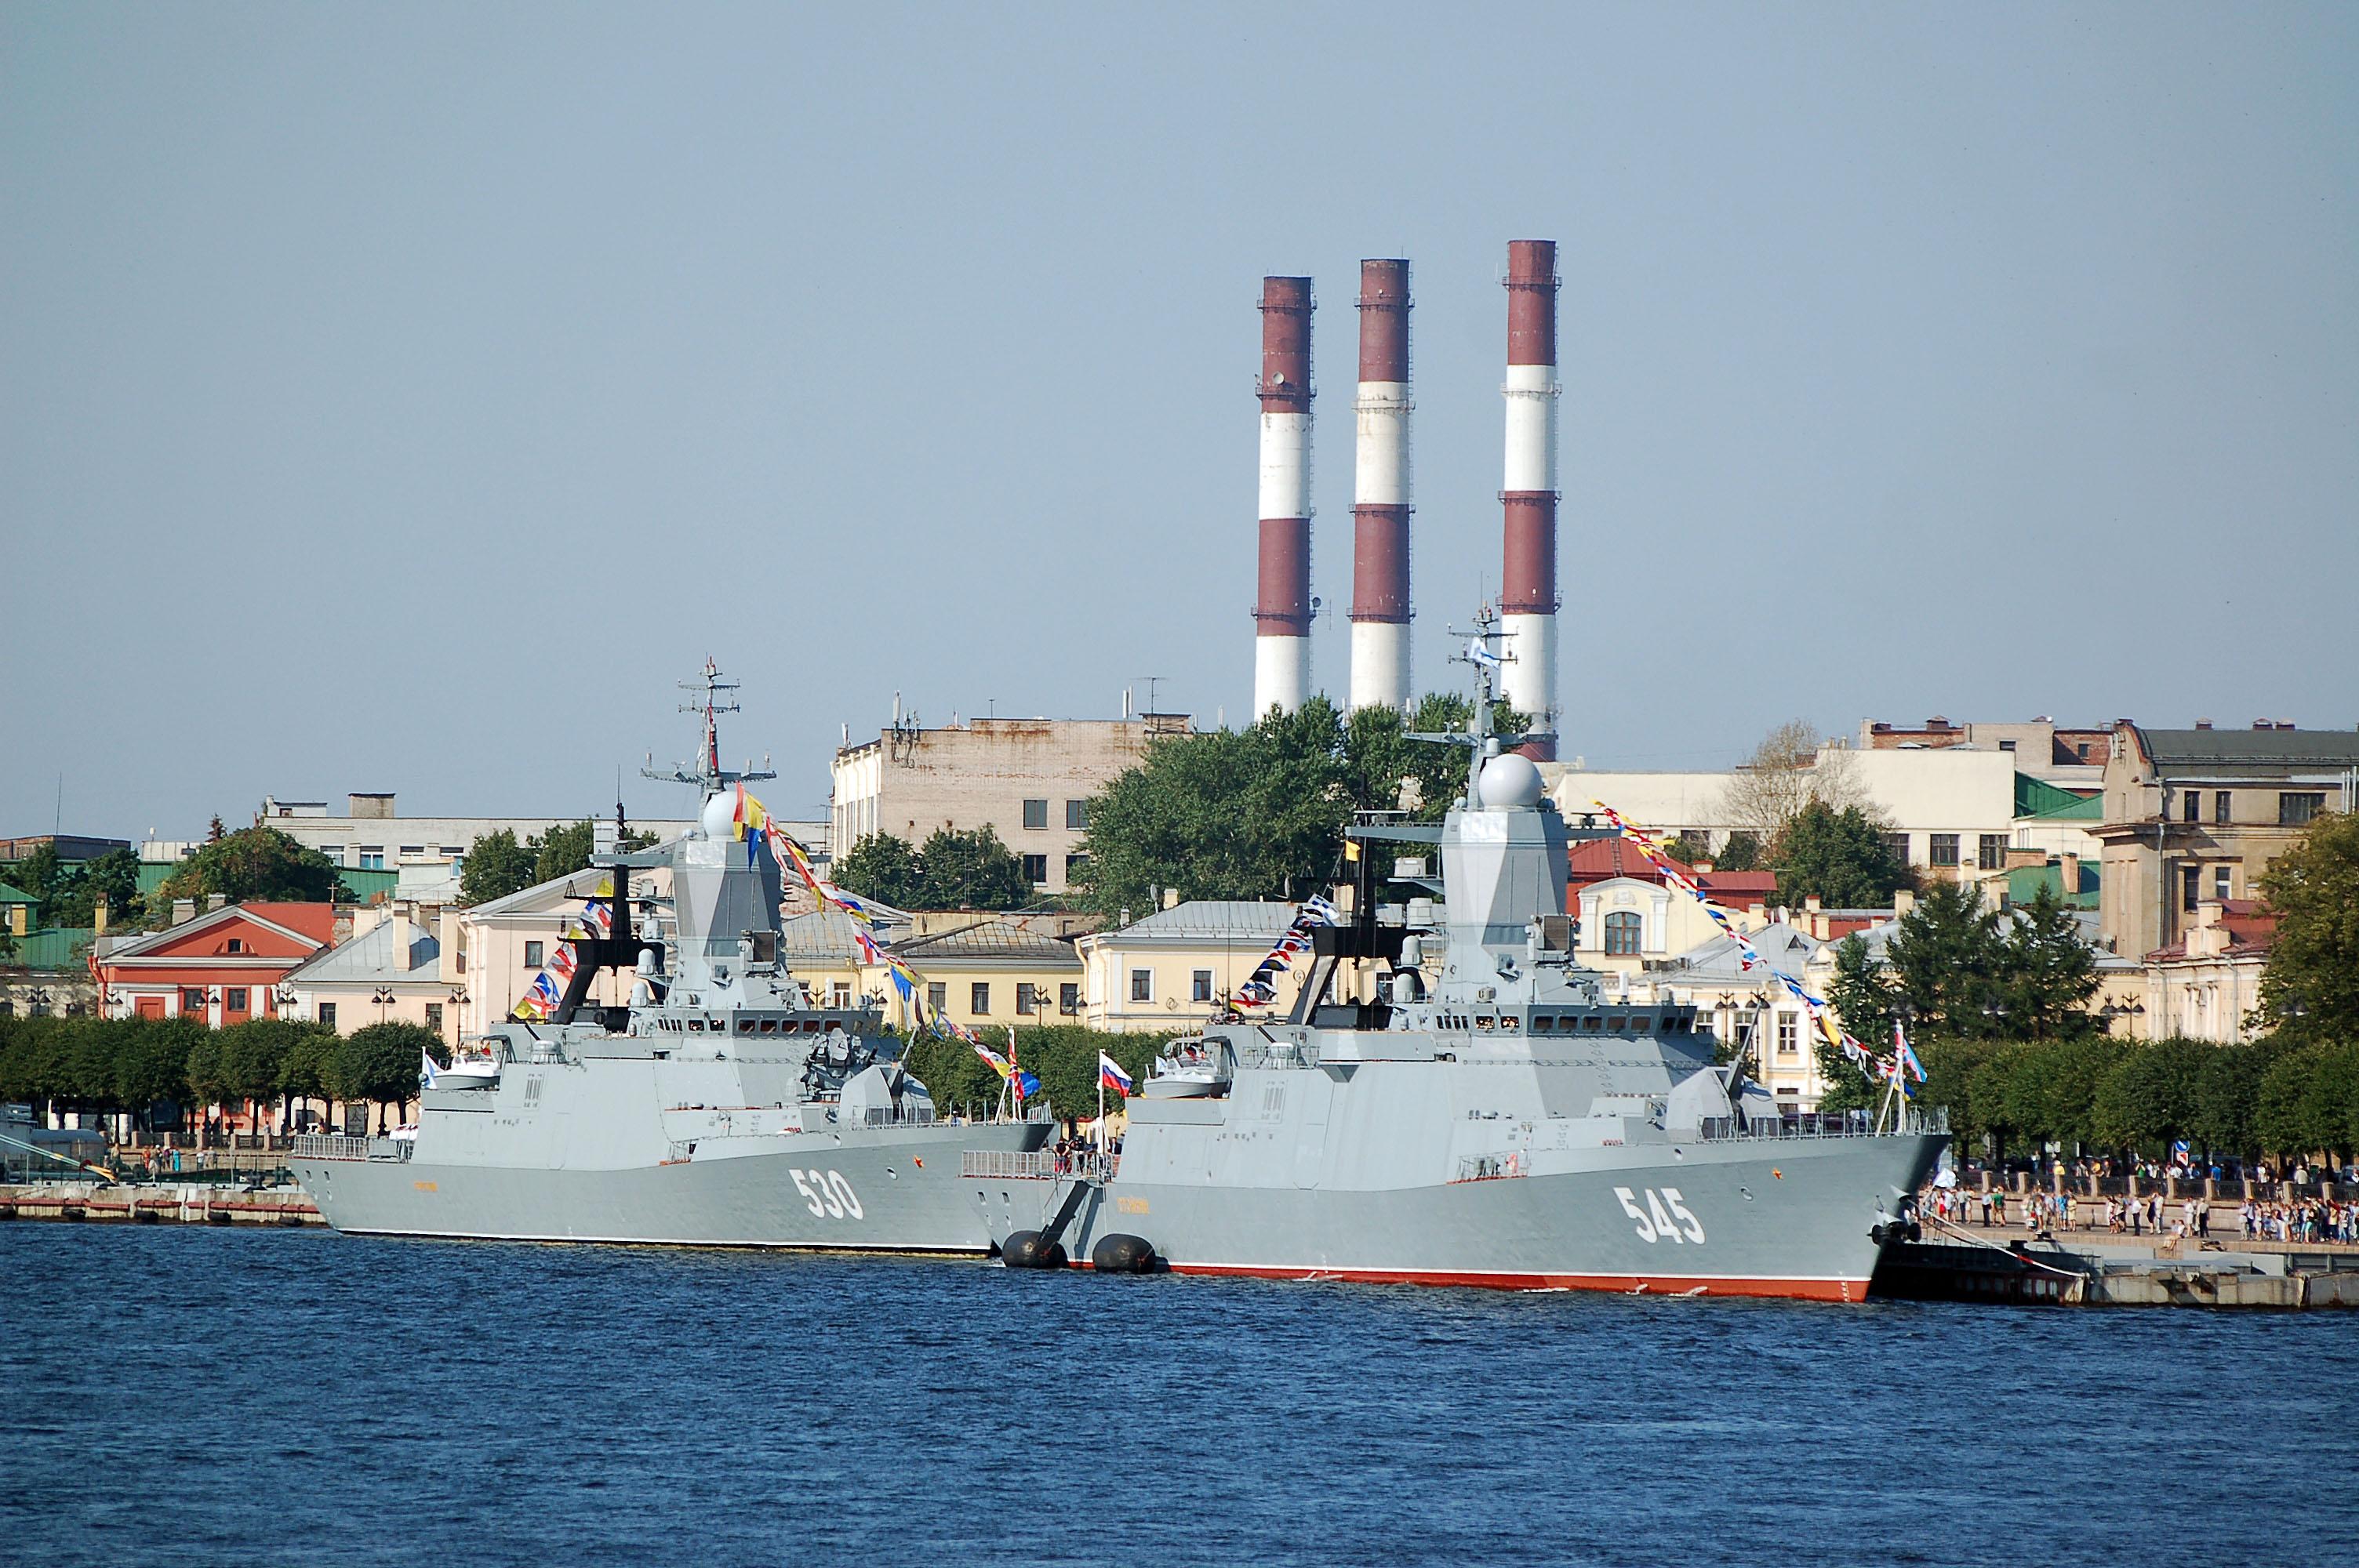 http://www.balancer.ru/sites/com/sh/shipspotting/photos/big/6/4/3/2286346.jpg